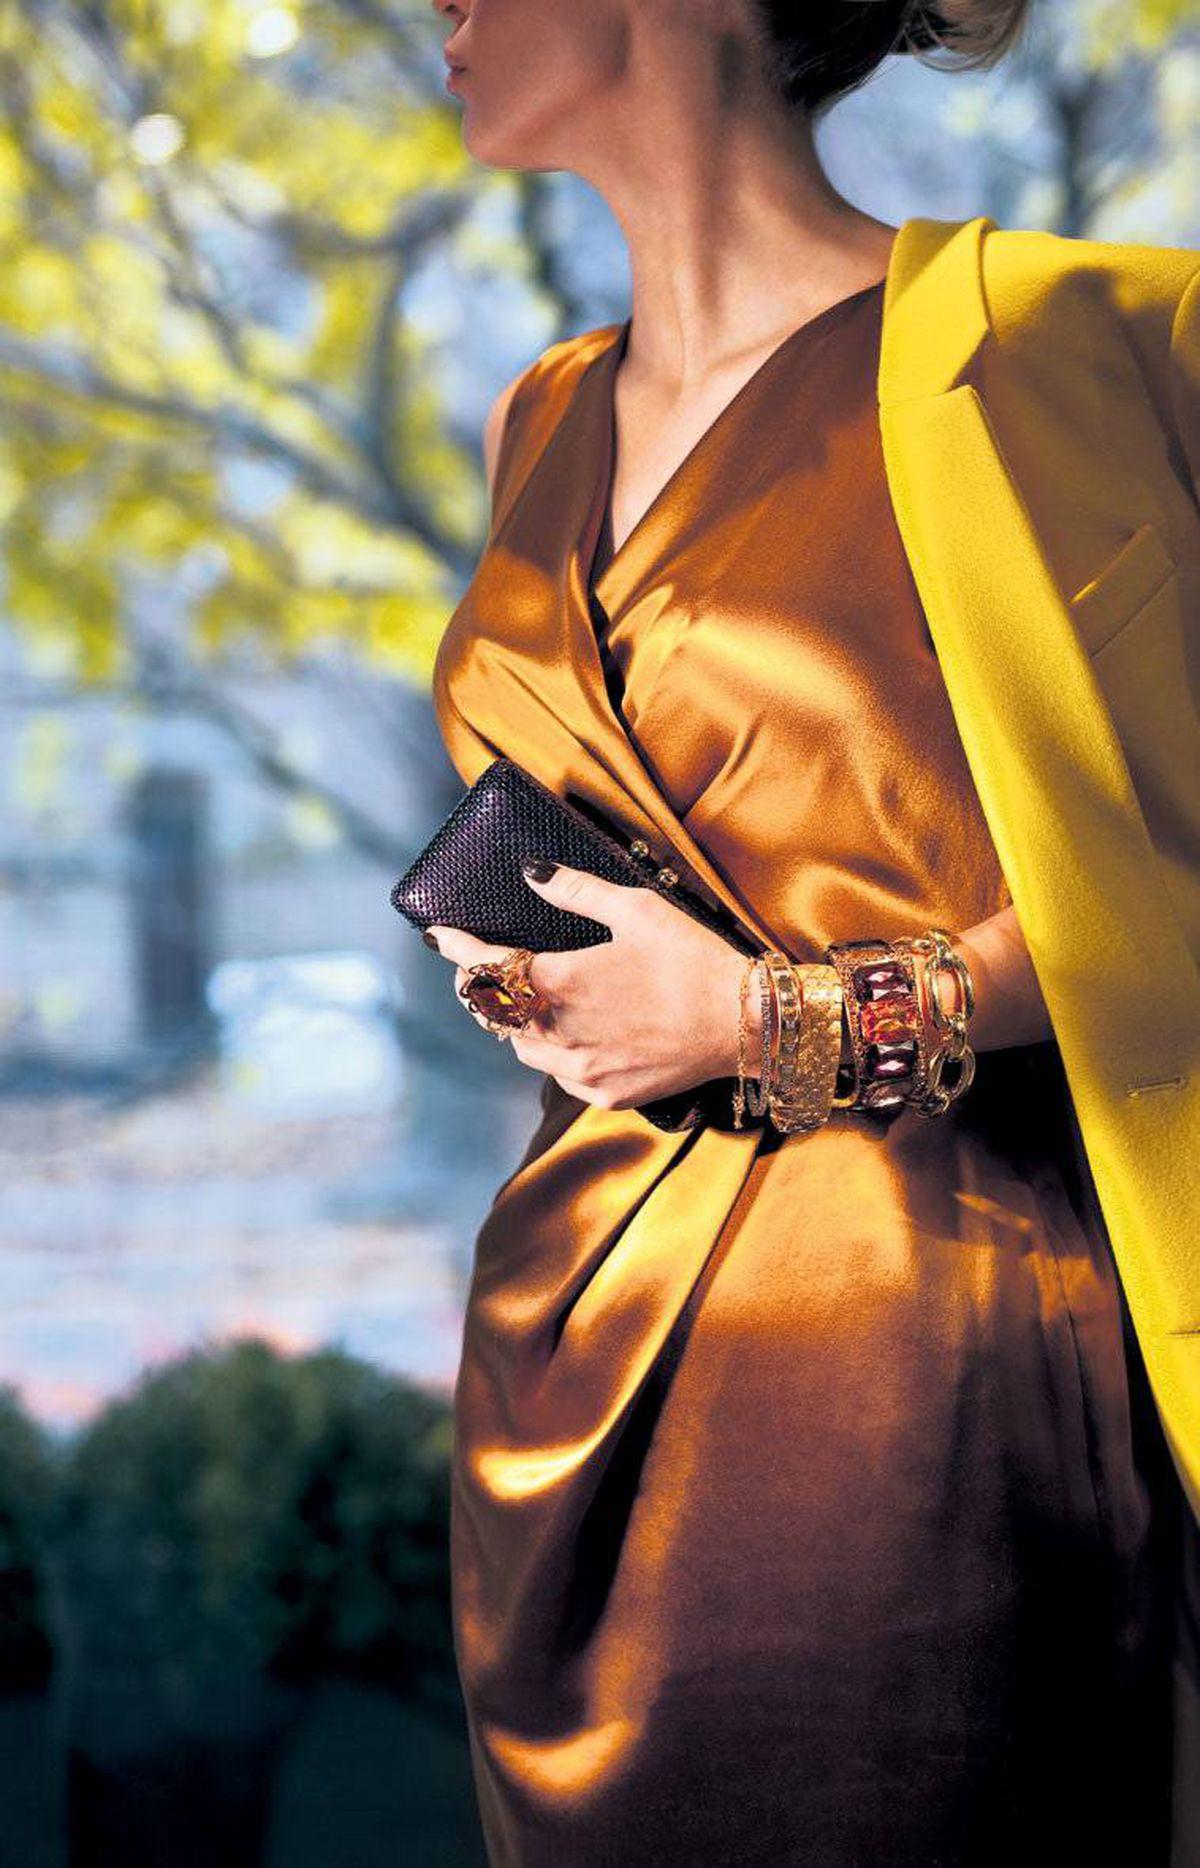 Ports 1961 sheath dress, $595 through www.ports1961.com. Balenciaga coat, $2,595 at Holt Renfrew (www.holtrenfrew.com). From left to right, Halston Heritage clutch, $195 at the Bay. Myles Mindham citrine ring, $6,000, gold bracelet, $500, diamond tennis bracelet, $14,750, gold studded bracelet, $10,850, hammered-gold bracelet, $6,900 through www.mindham.com. Rita Tesolin gold and purple cuff, $150. Myles Mindham 18-karat-gold bracelet, $13,400.